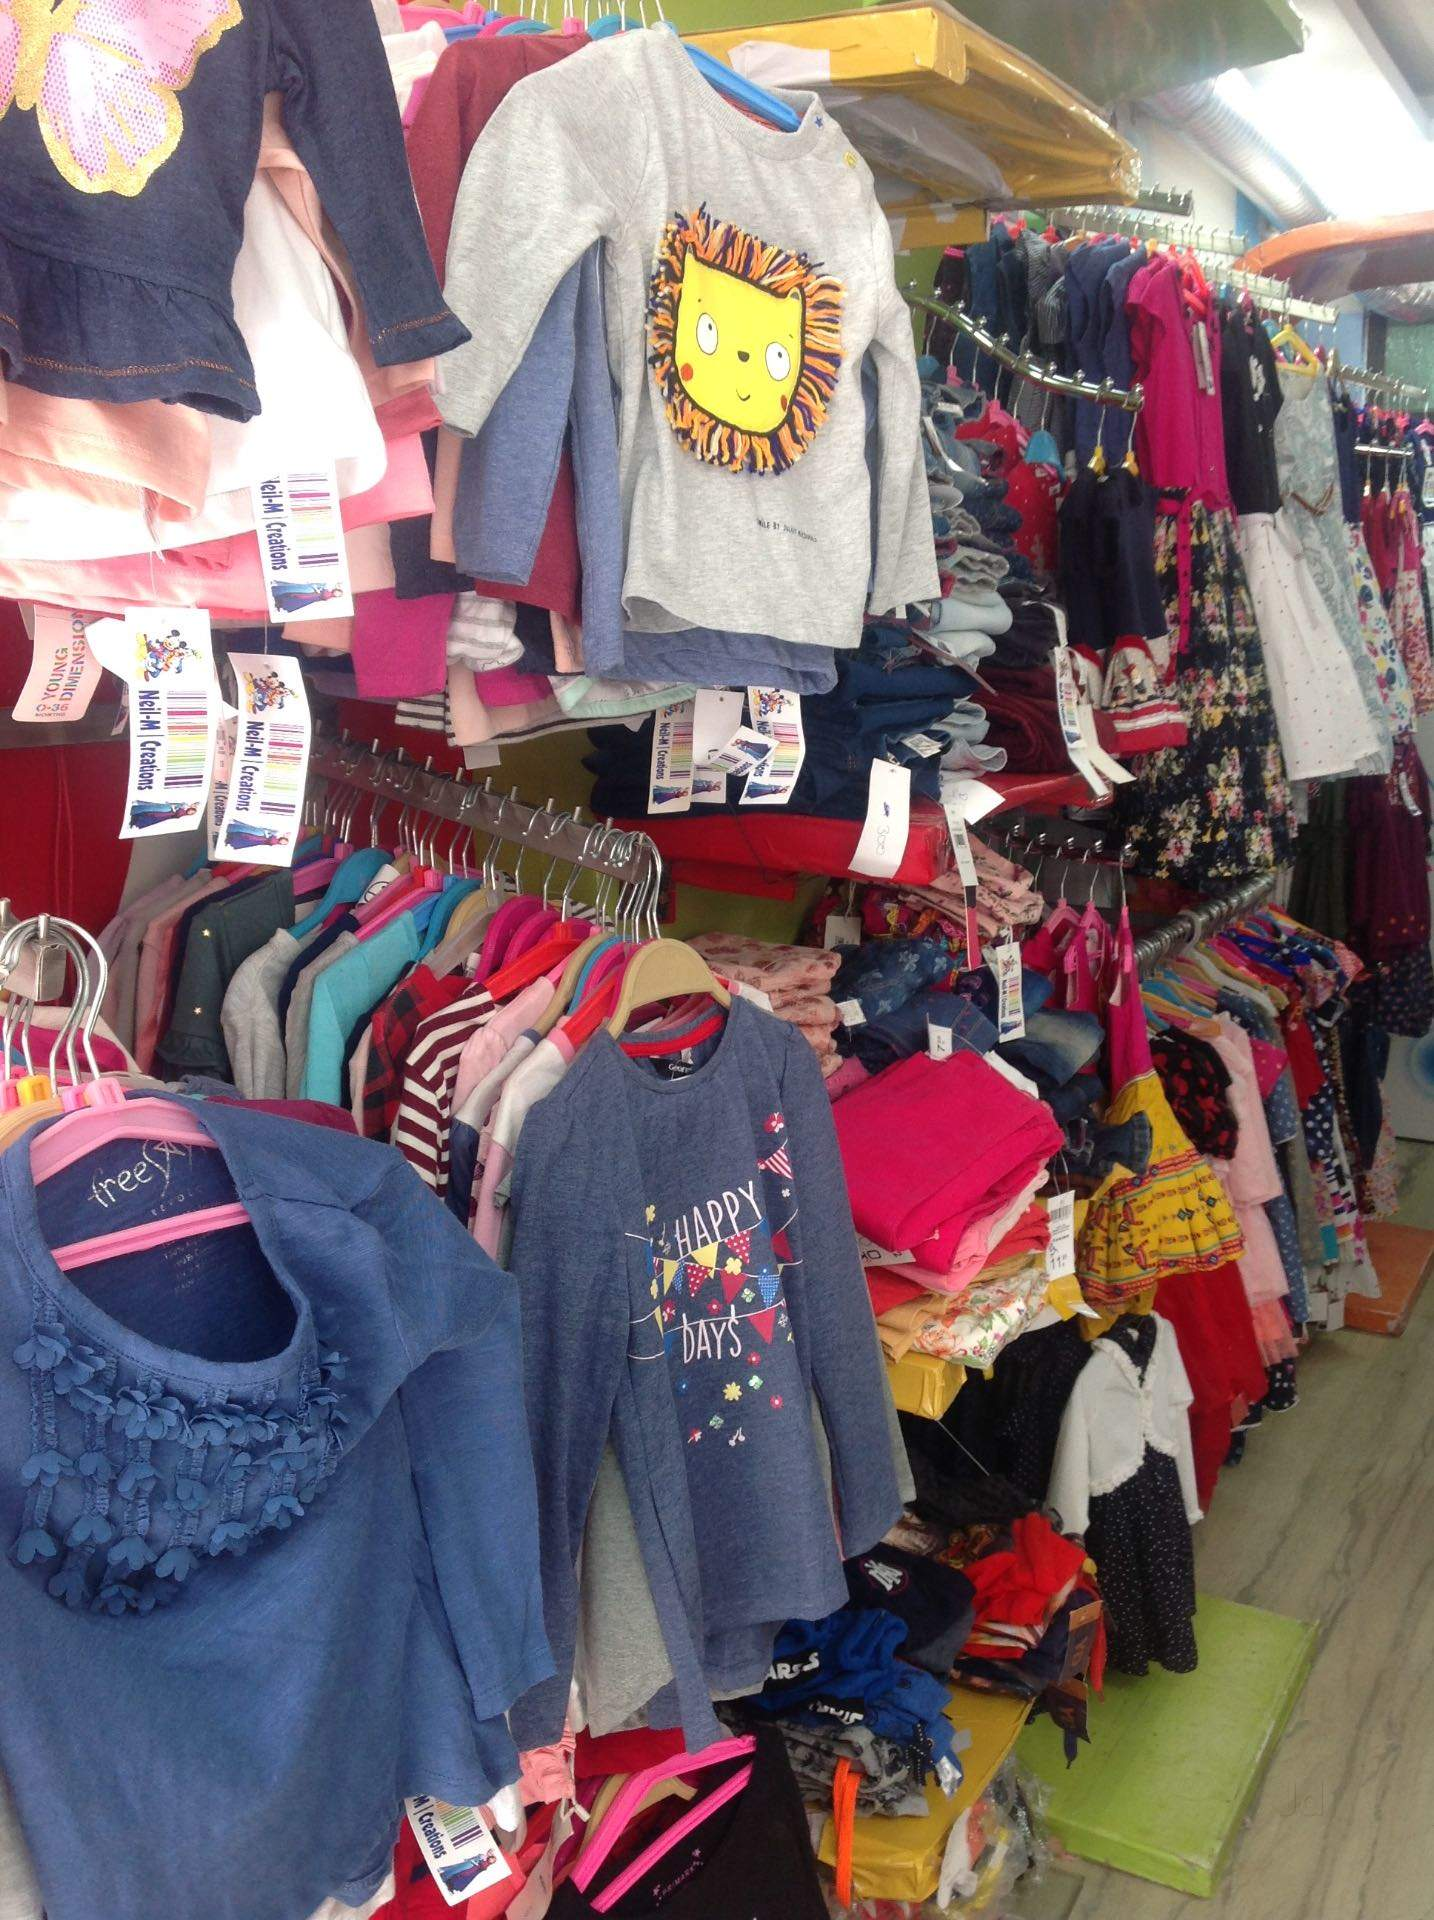 a77d5af45 Top 100 Children Readymade Garment Retailers in Delhi - Best Kids ...